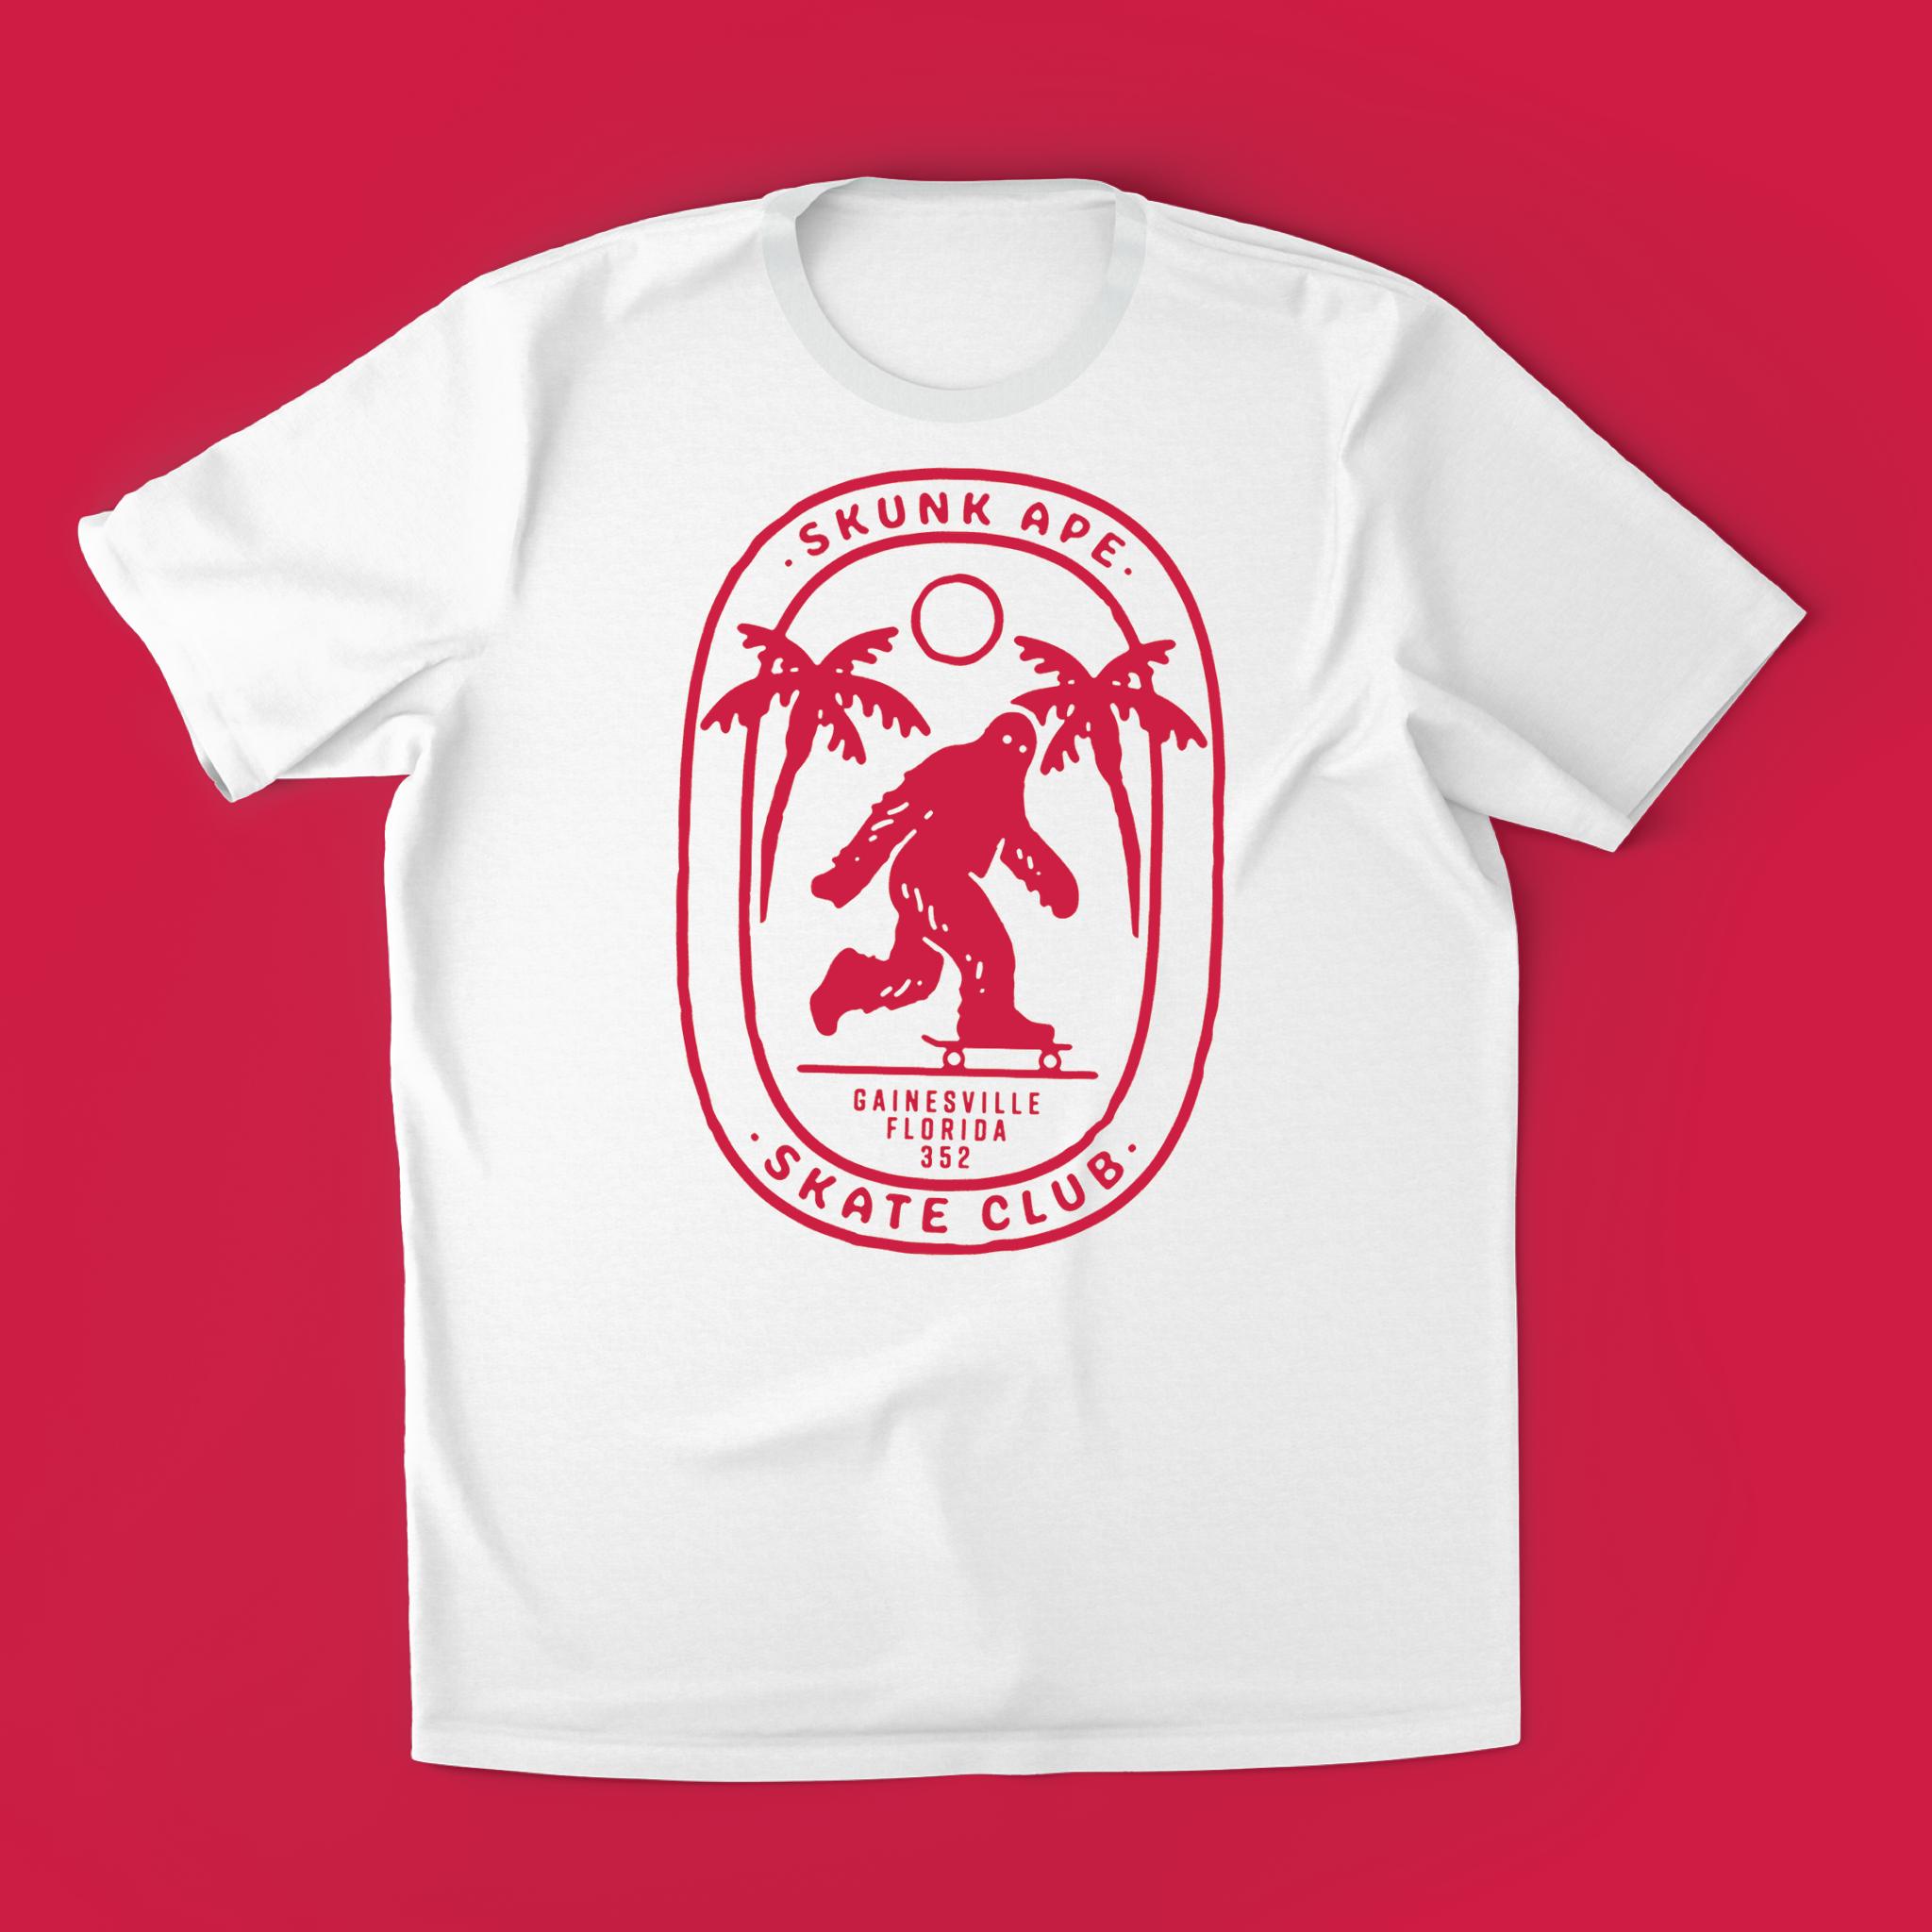 Skunk Ape Skate Club T-shirt